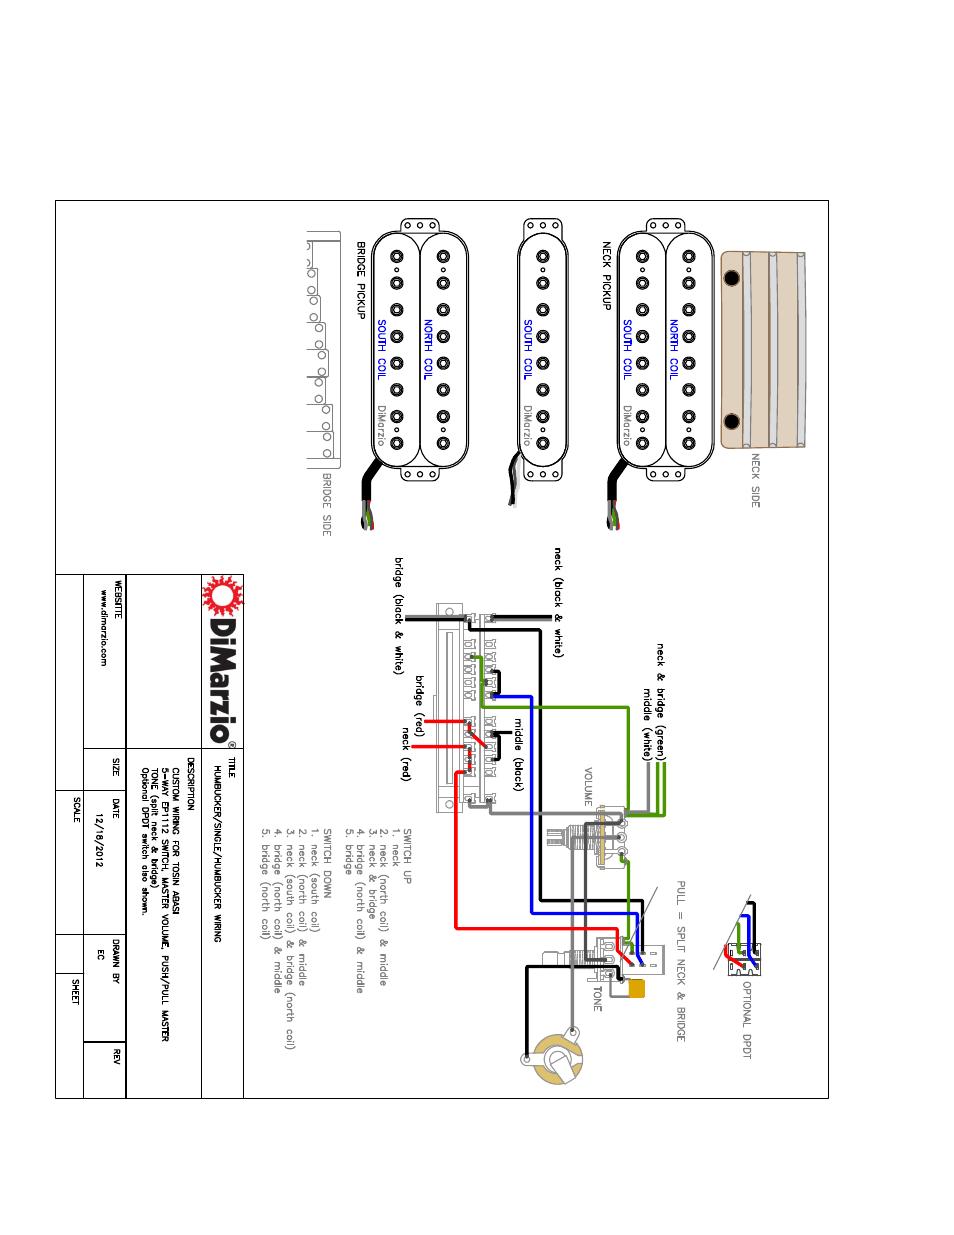 dimarzio evolution wiring diagram sg